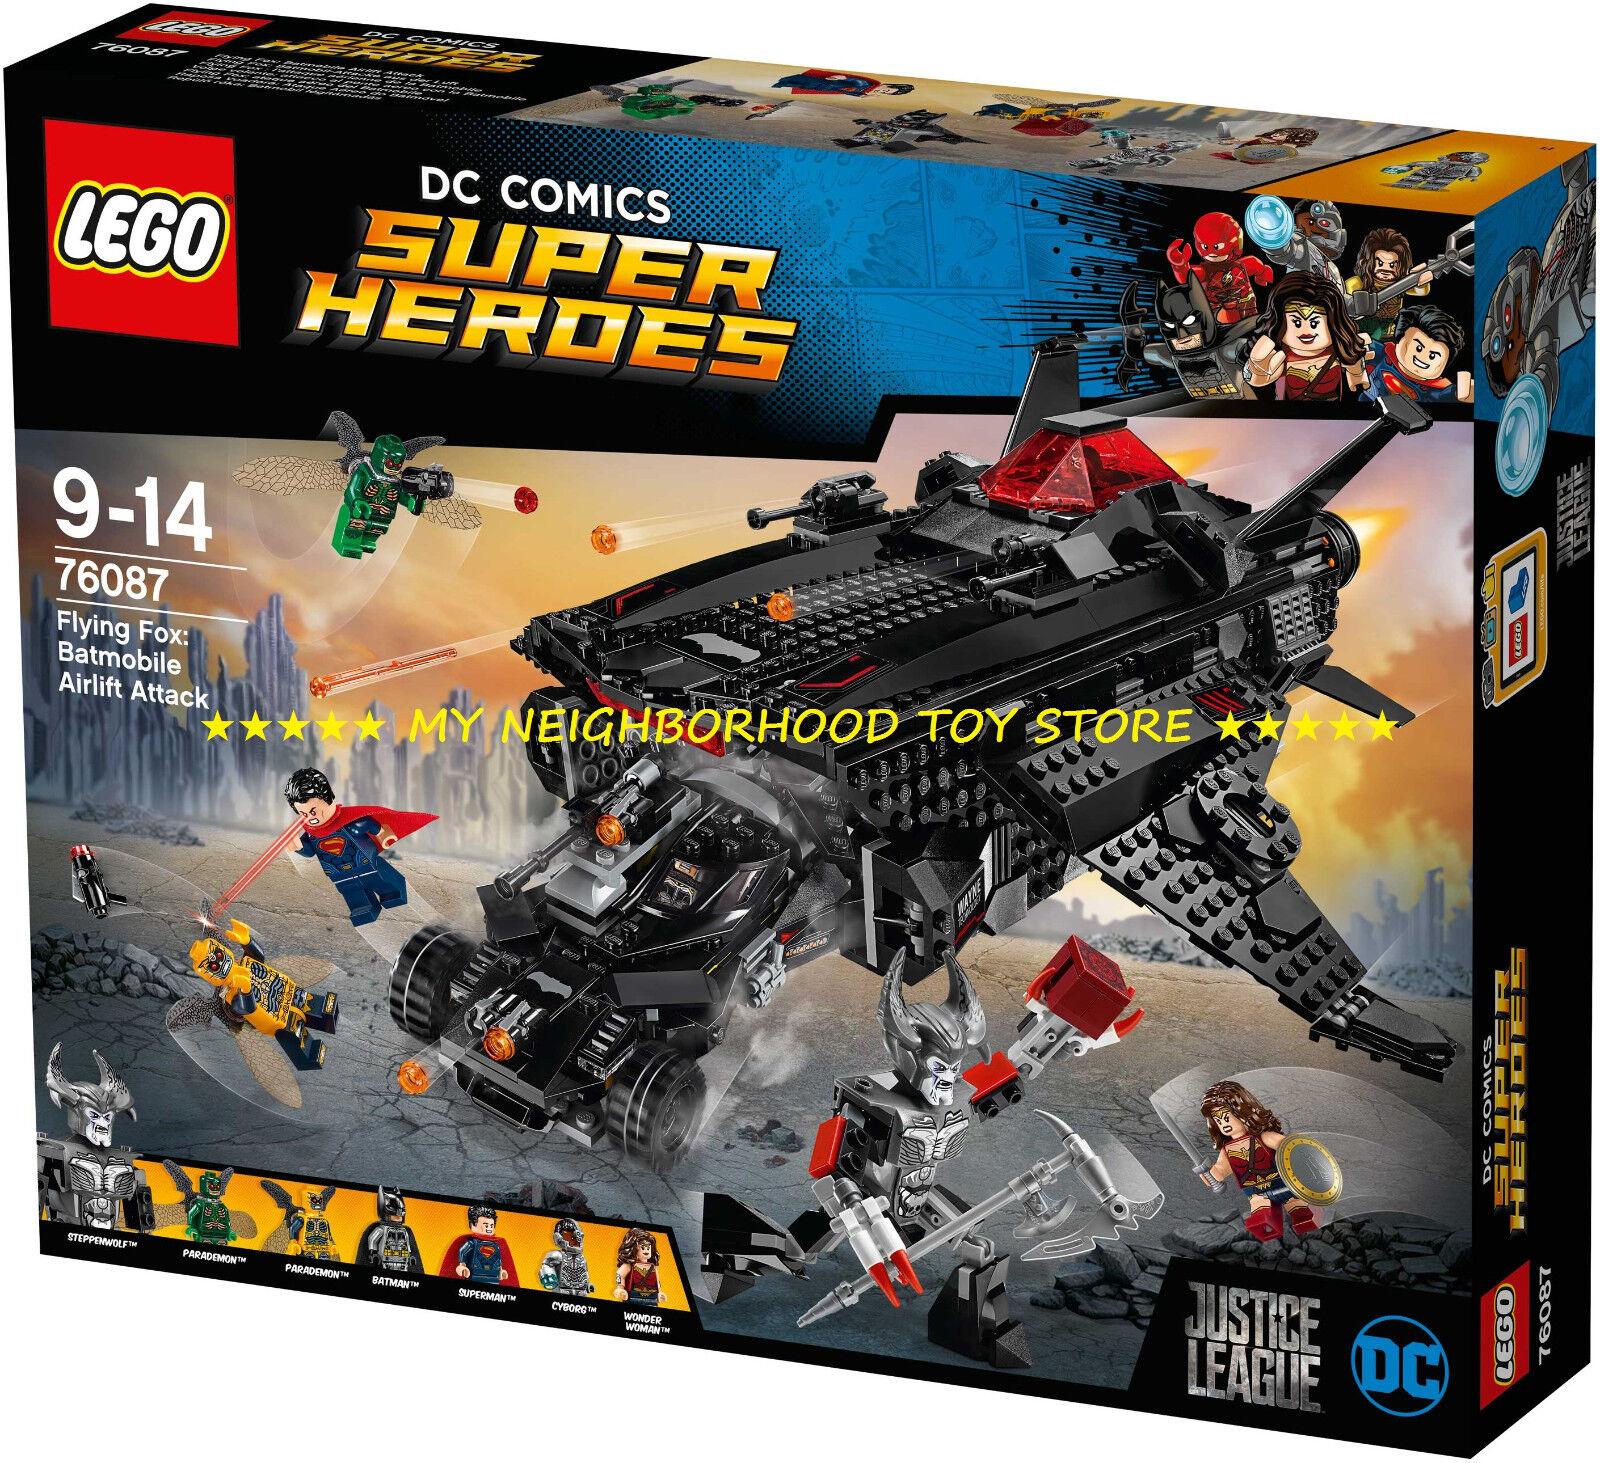 PR. CONS. - LEGO 76087 DC COMICS VOLPE VOLANTE ATTACCO PONTE AEREO CON BATMOBILE